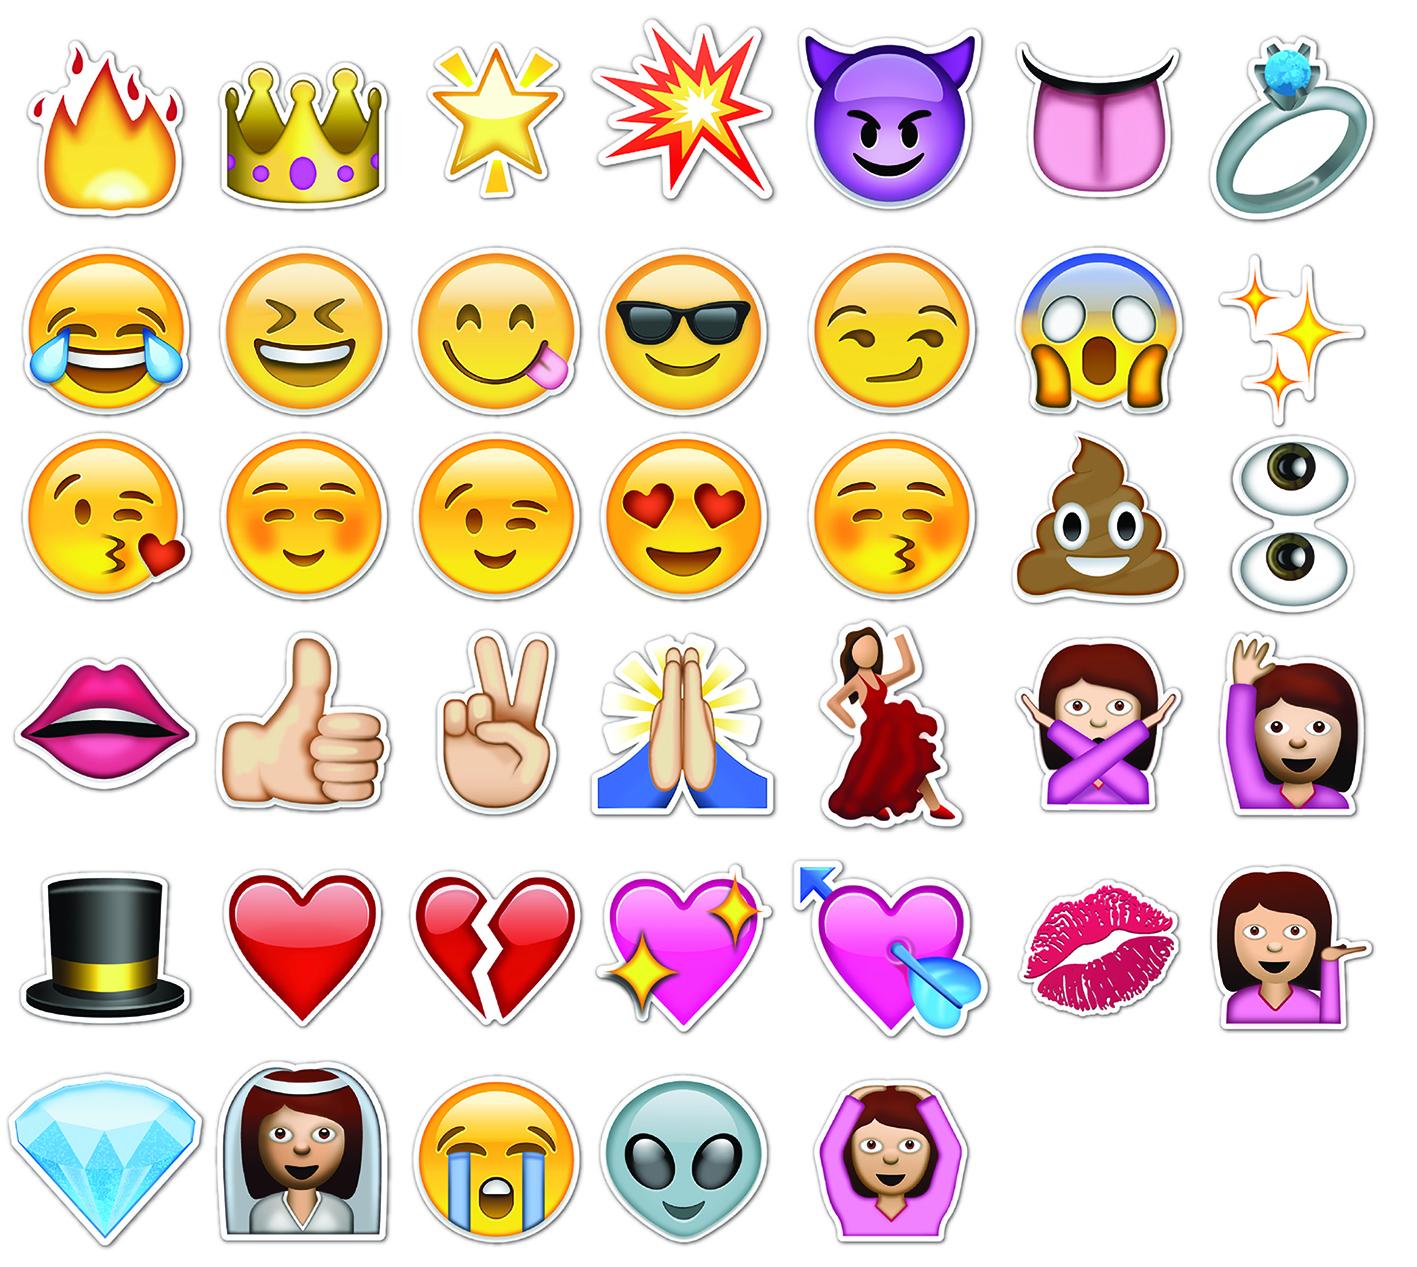 Atrezzo Emojis Letras Xxl